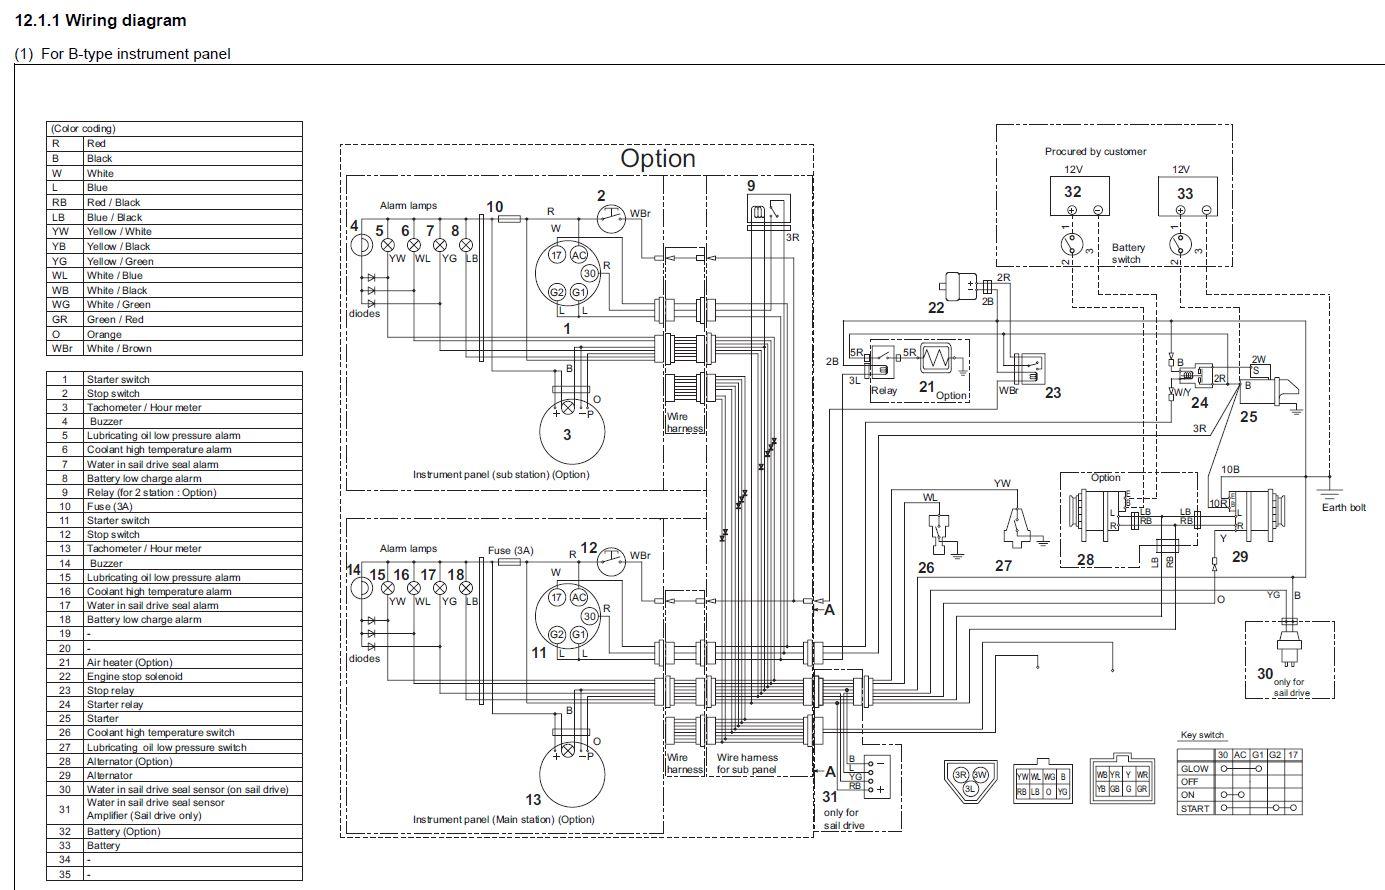 international cab diagram case ih 2366 combine wire